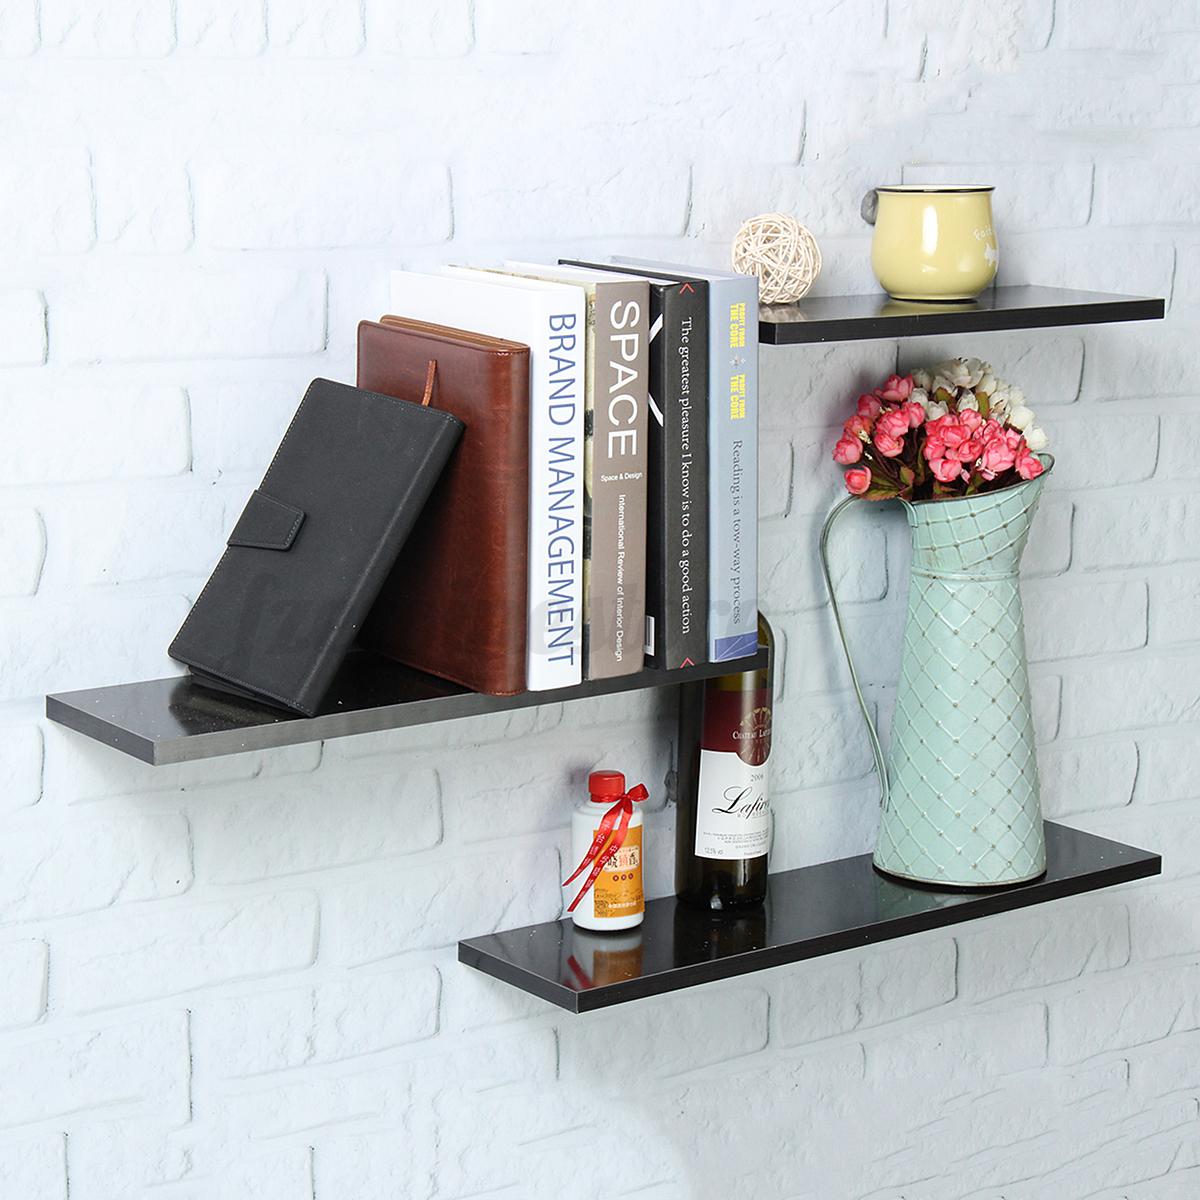 3x floating wall shelf mounted high gloss display shelves bookshelf storage kit ebay. Black Bedroom Furniture Sets. Home Design Ideas